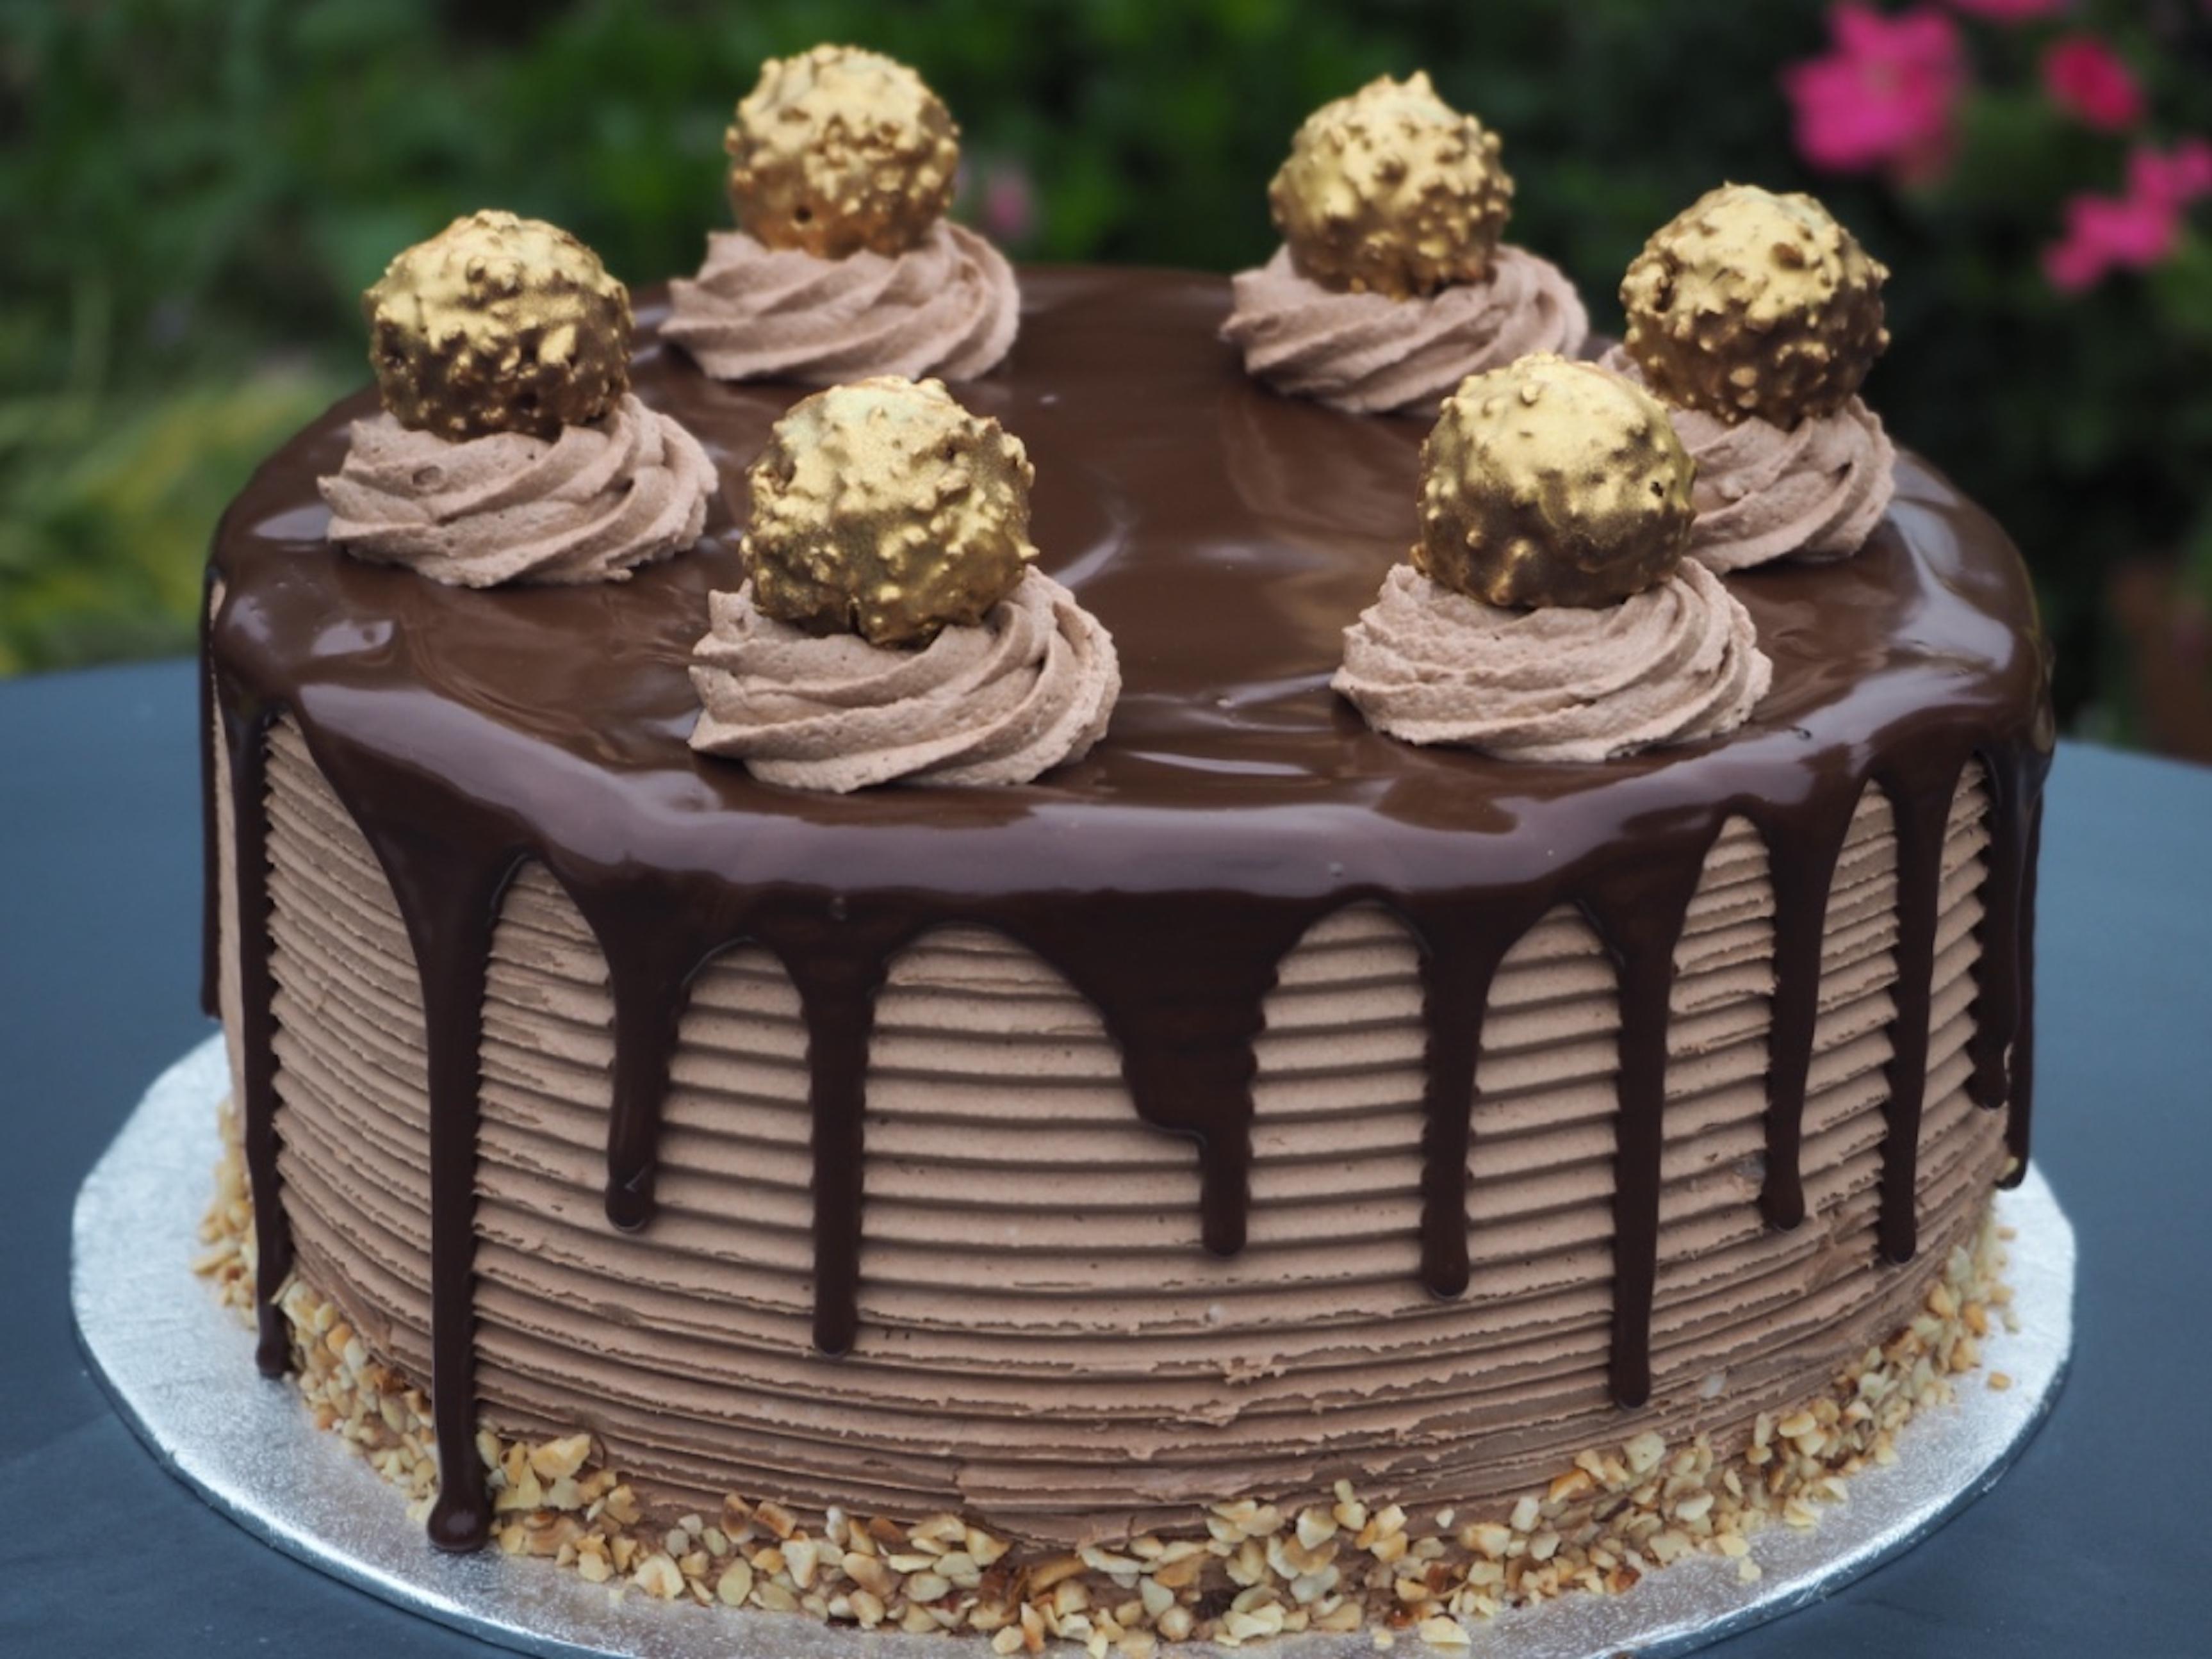 Nutella Oreo Birthday Cake Image Inspiration of Cake and Birthday